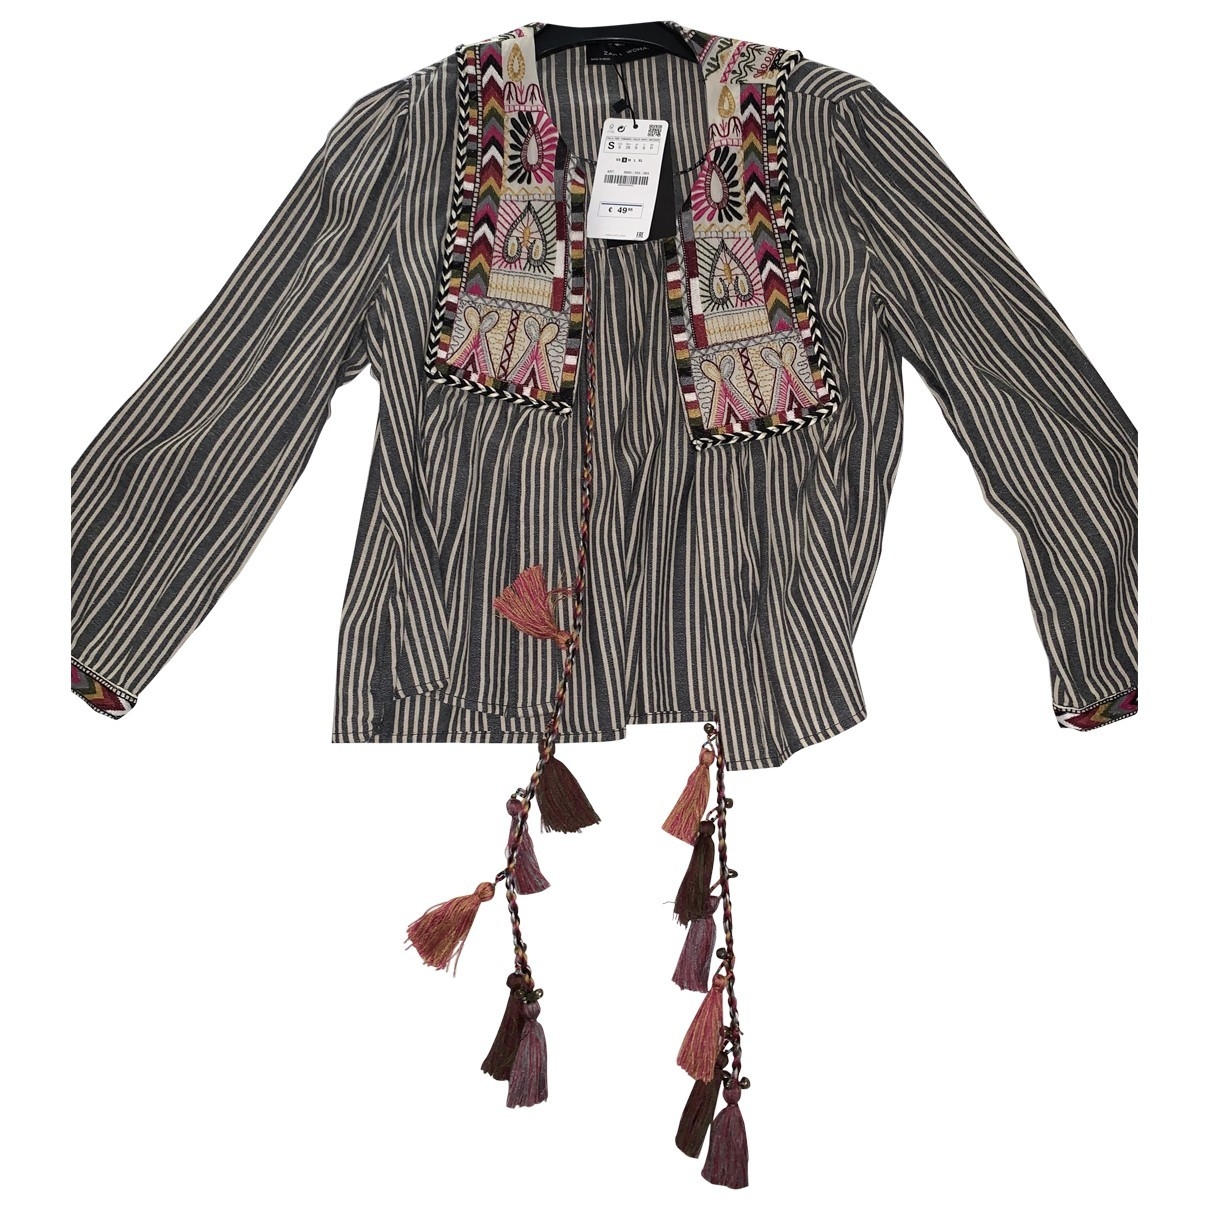 Zara \N Anthracite jacket for Women S International